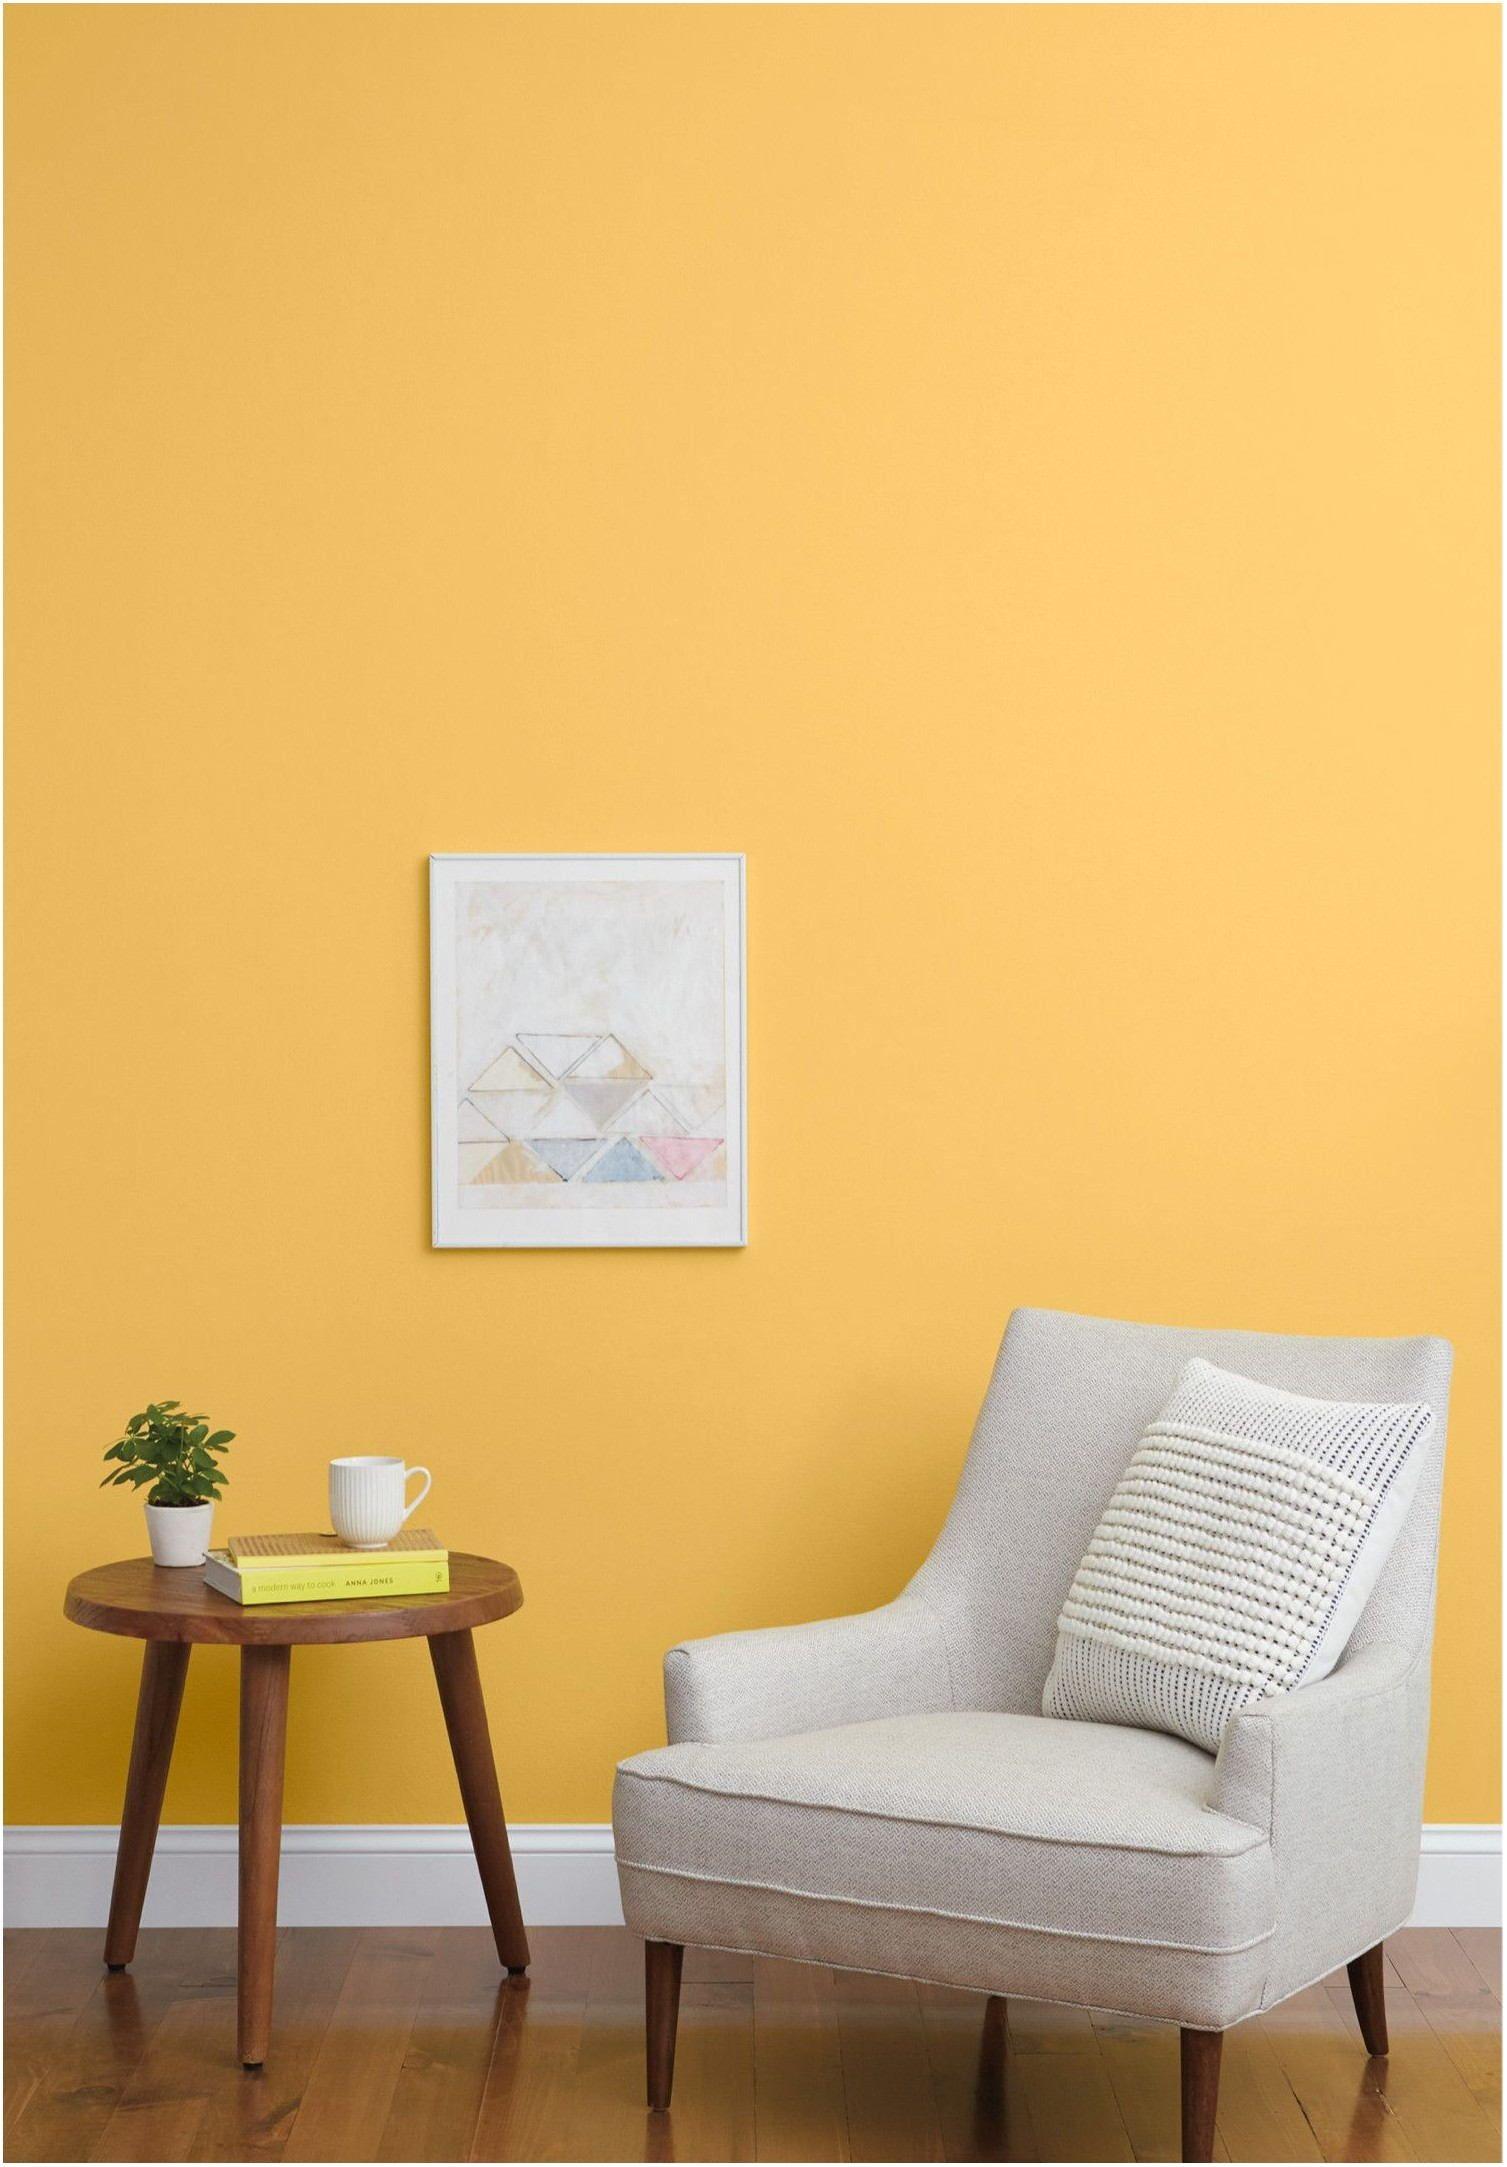 Best Gold Paint Color For Living Room Paint Colors For Living Room Living Room Colors Living Room Paint #paint #living #room #pictures